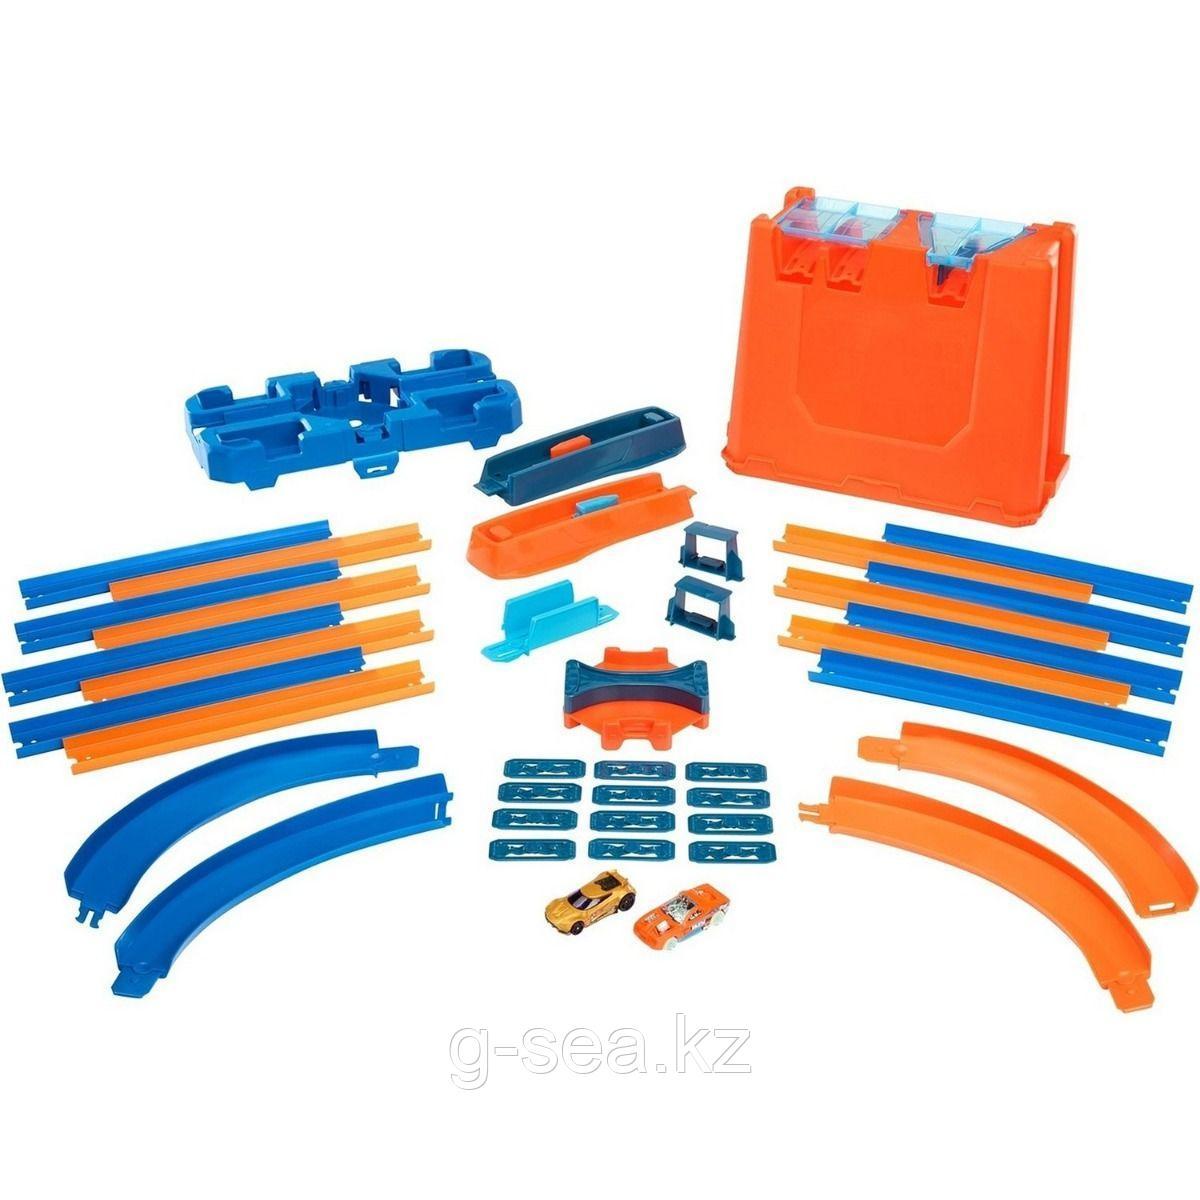 Hot Wheels: Track Builder. Игровой набор STUNT BOX